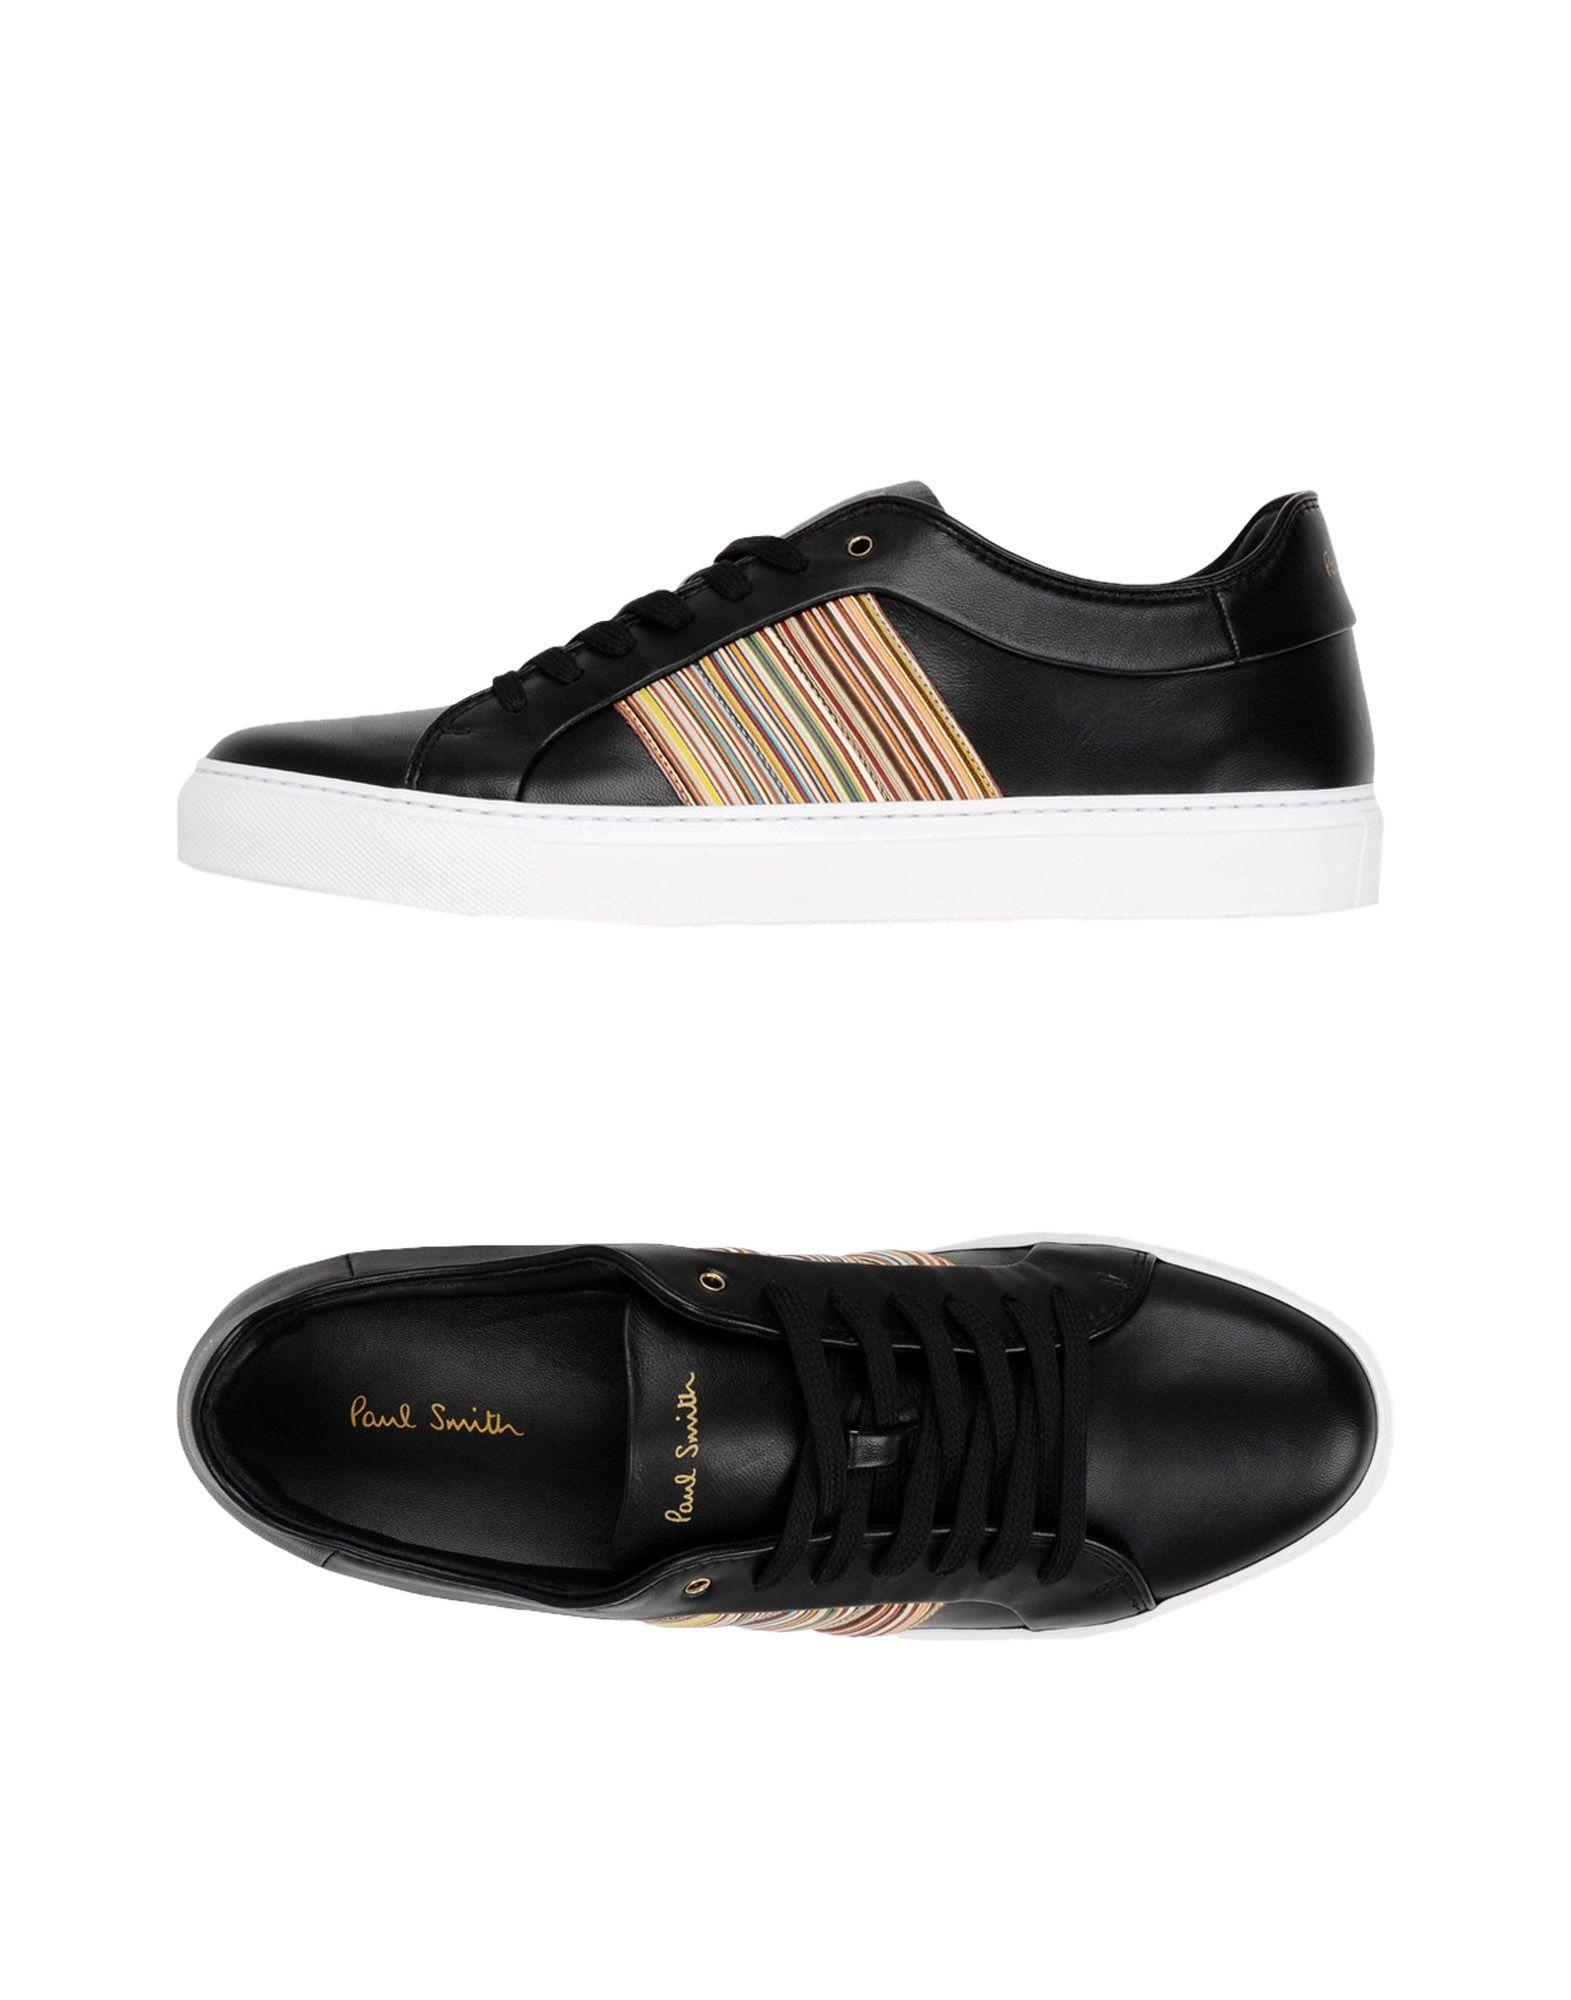 PAUL SMITH Herren Low Sneakers & Tennisschuhe Farbe Schwarz Größe 9 jetztbilligerkaufen